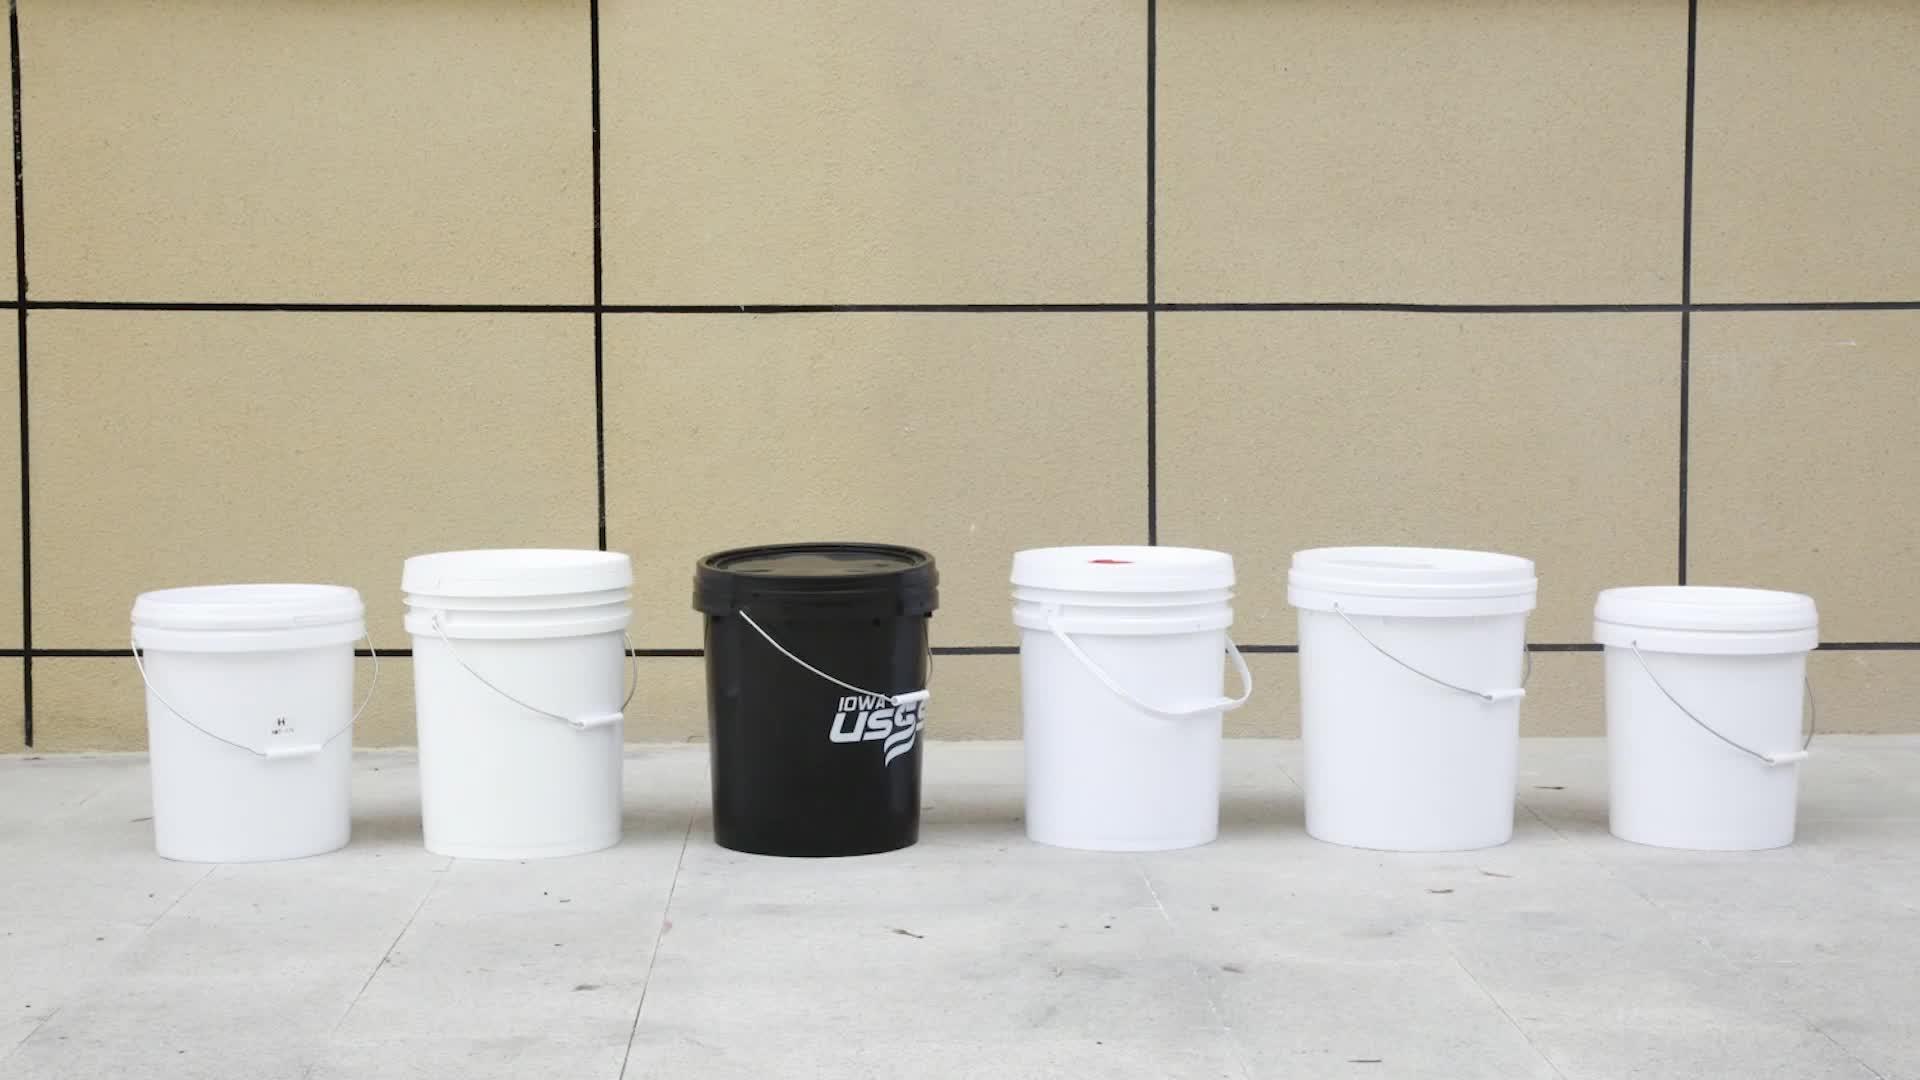 Großhandel günstige aquaponics erdbeere hydrokultur system bato eimer